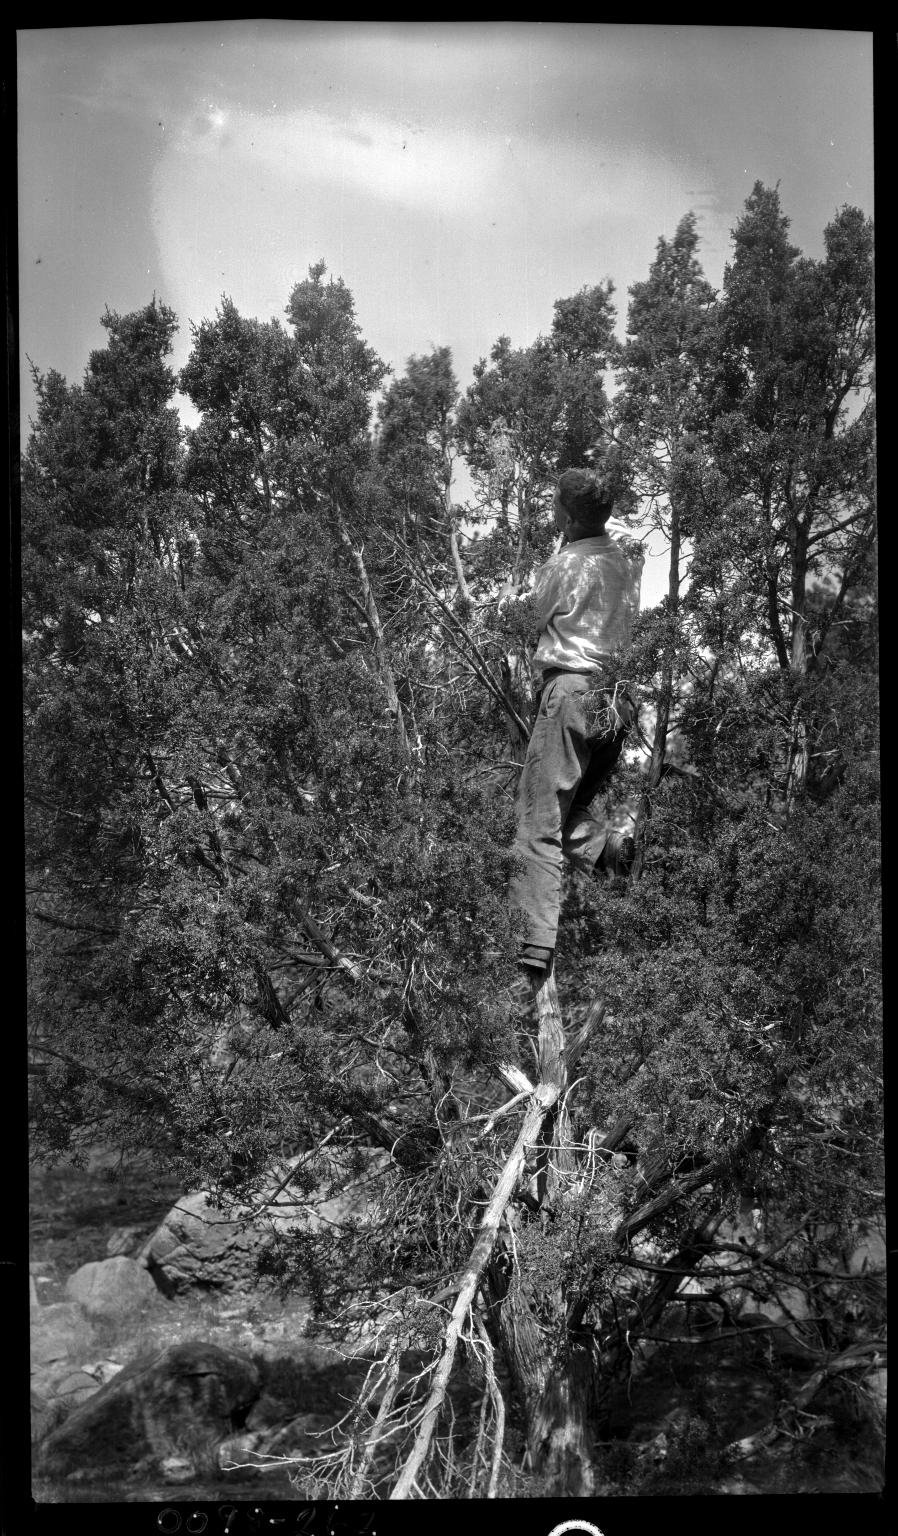 Manclimbing tree to Bushtit nest